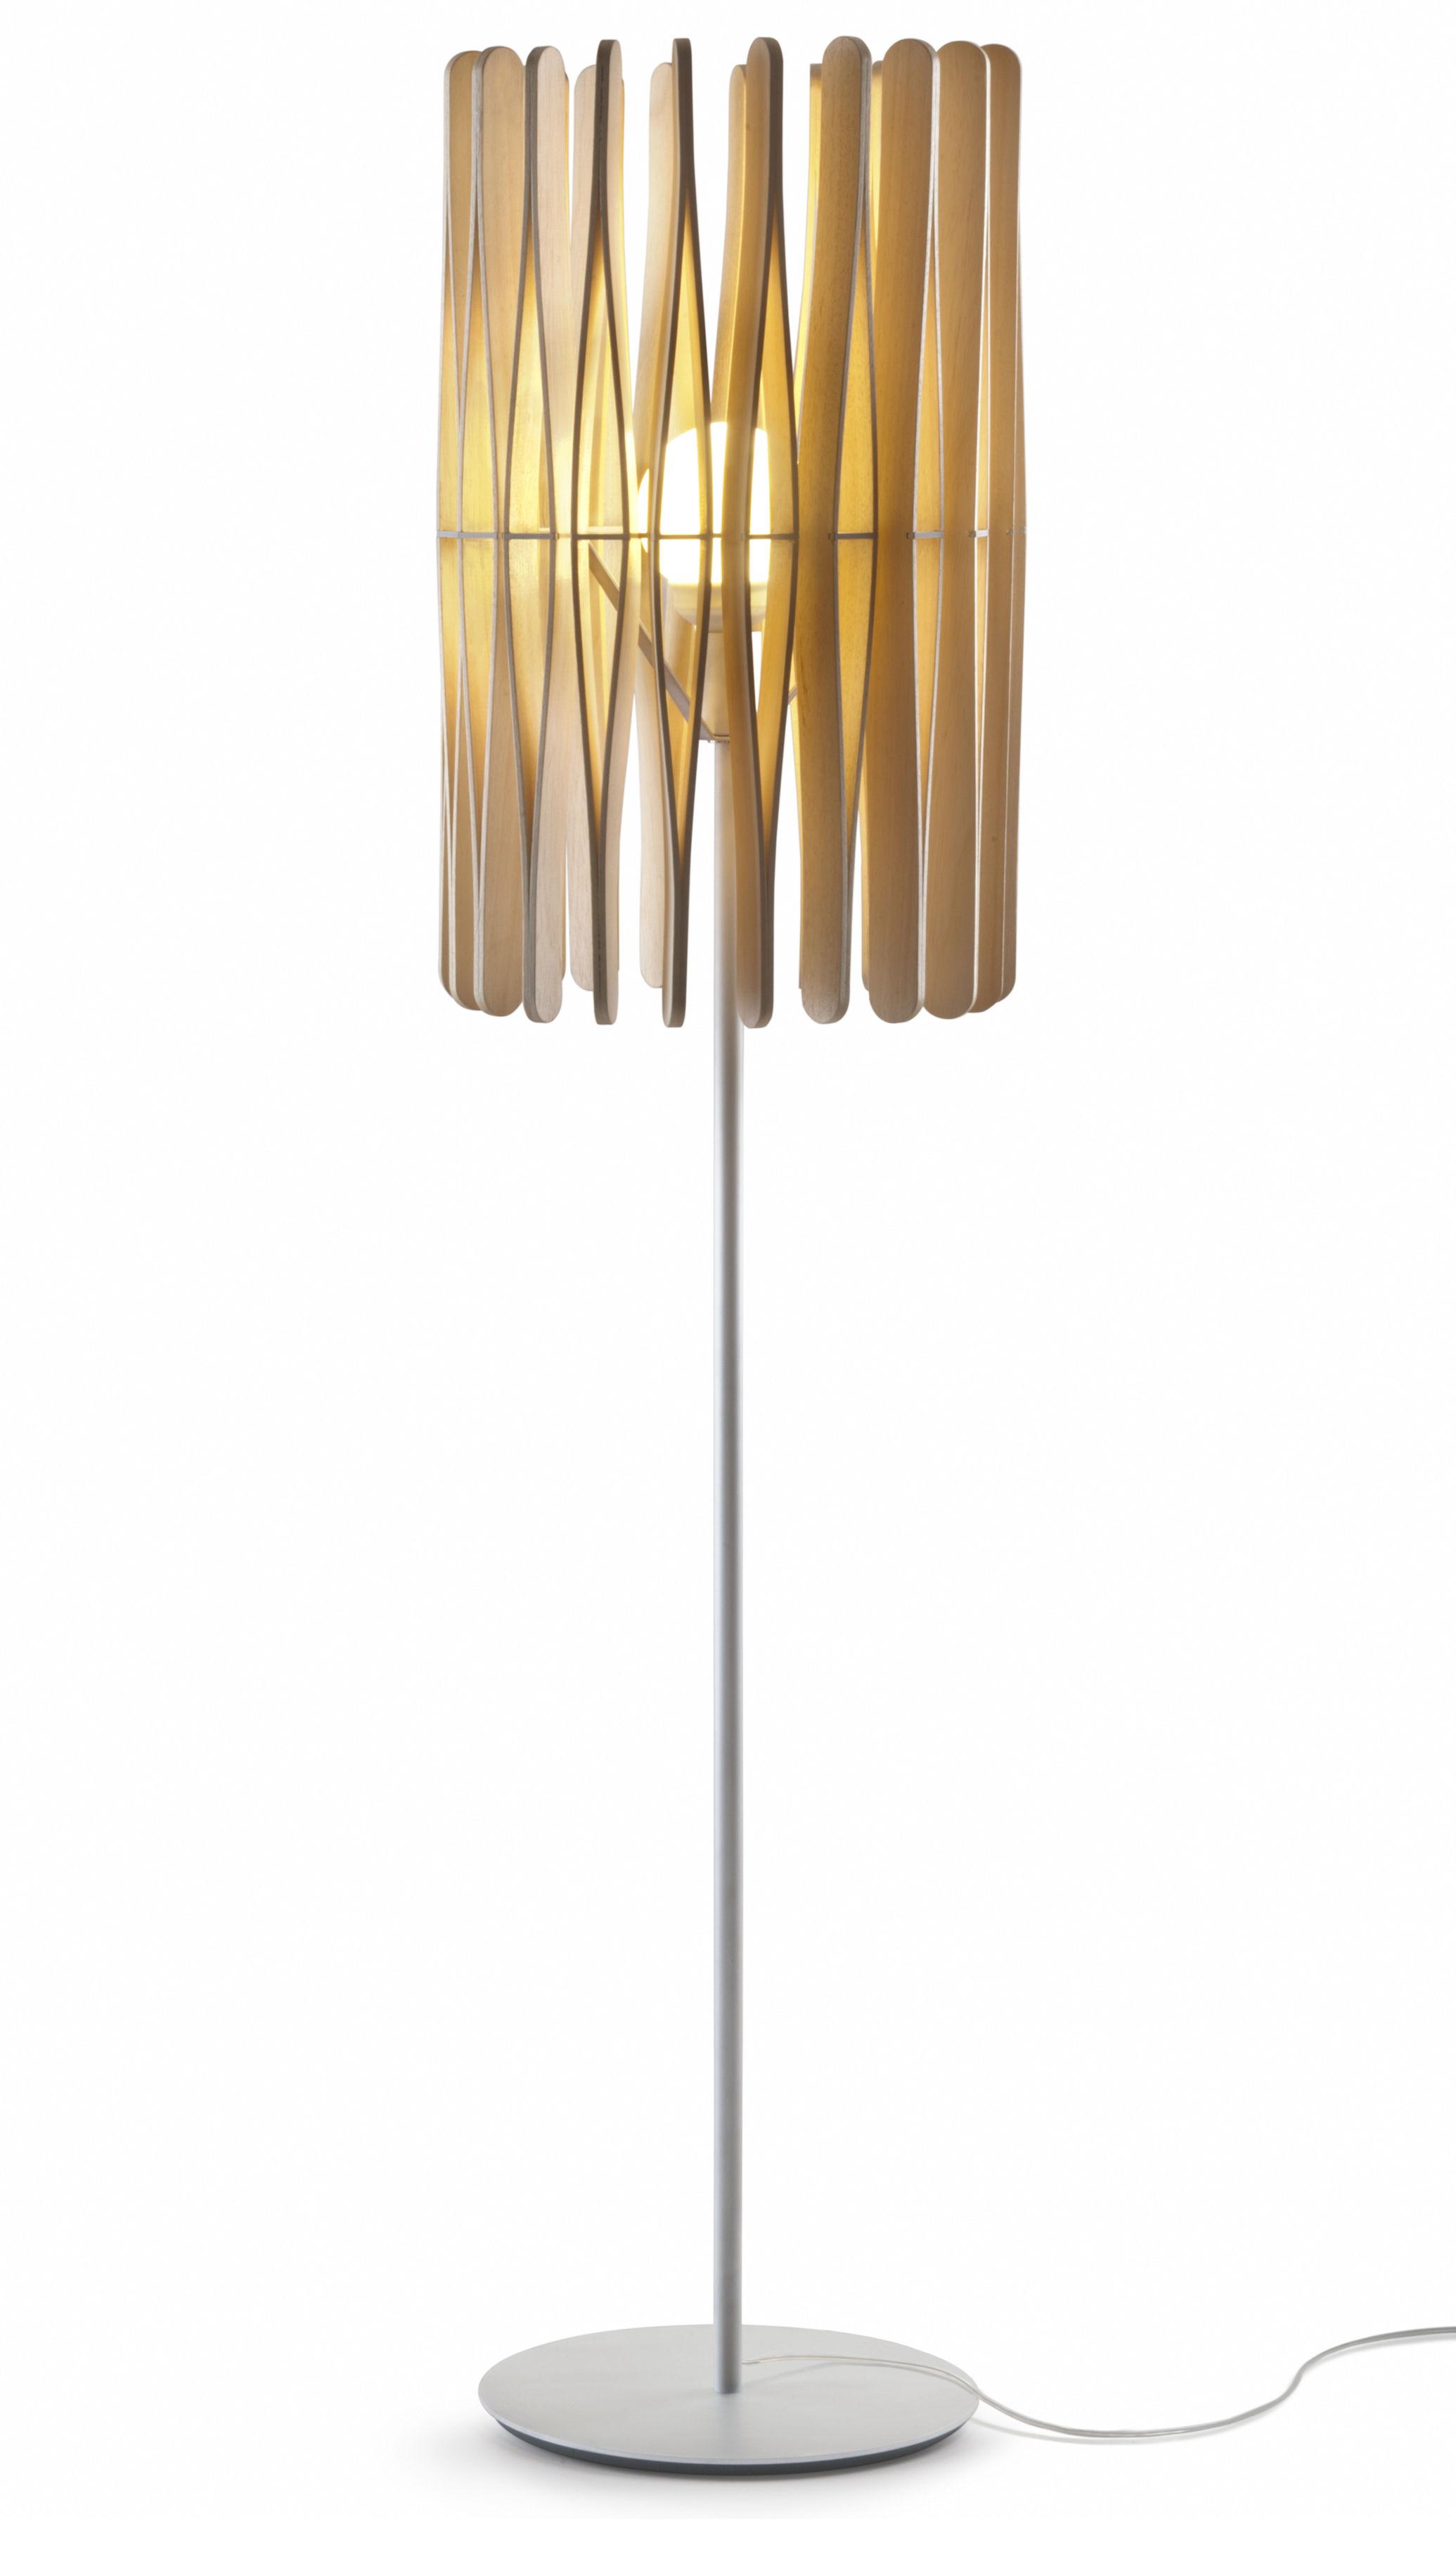 Leuchten - Stehleuchten - Stick 01 Stehleuchte / Lampenschirm Ø 43 x H 65 cm - Fabbian - Holz, hell / Modell 1 - Bois Ayous, lackiertes Metall